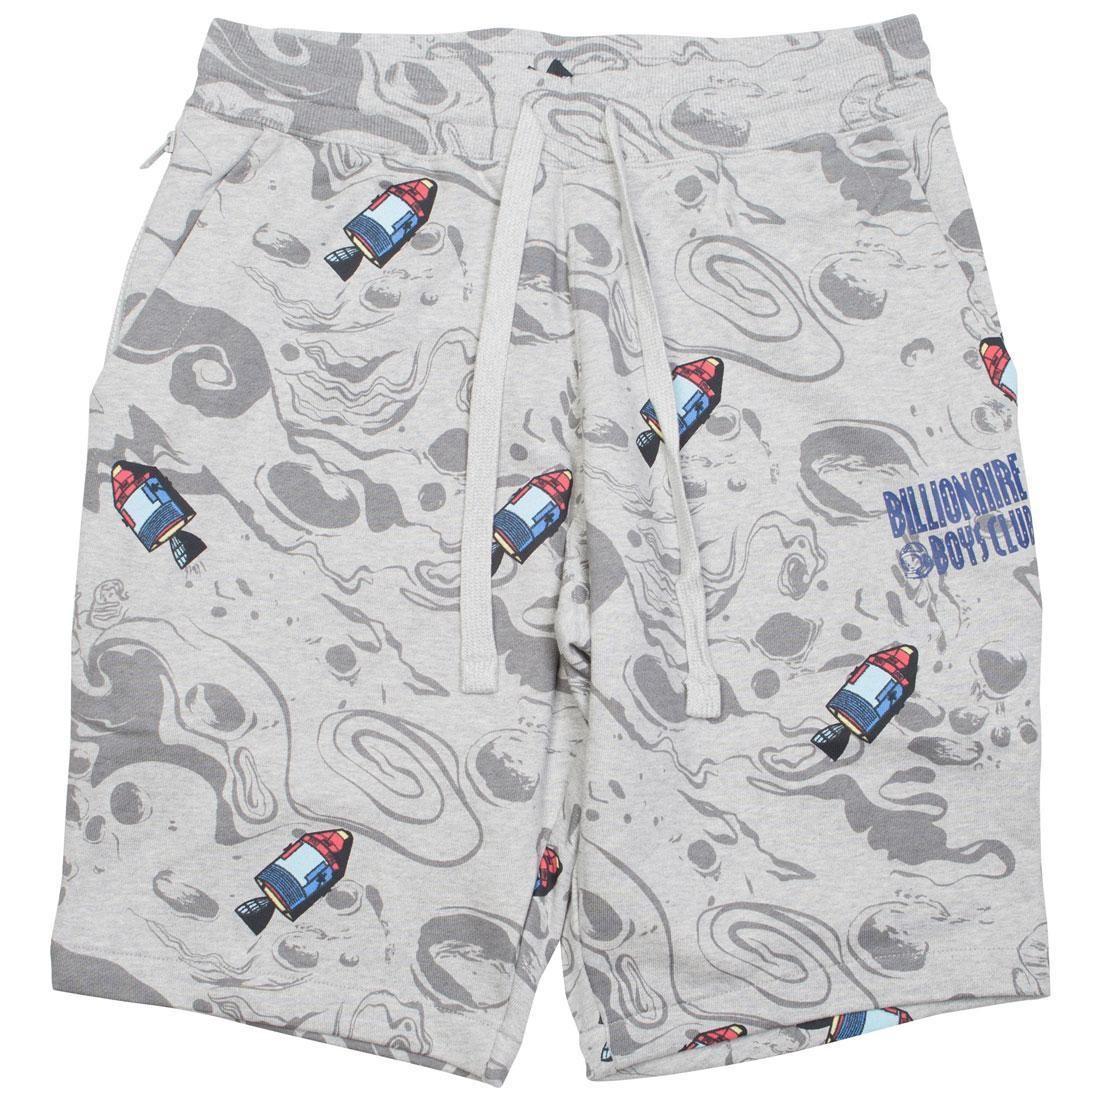 Billionaire Boys Club Men Regolith Shorts (gray / heather)